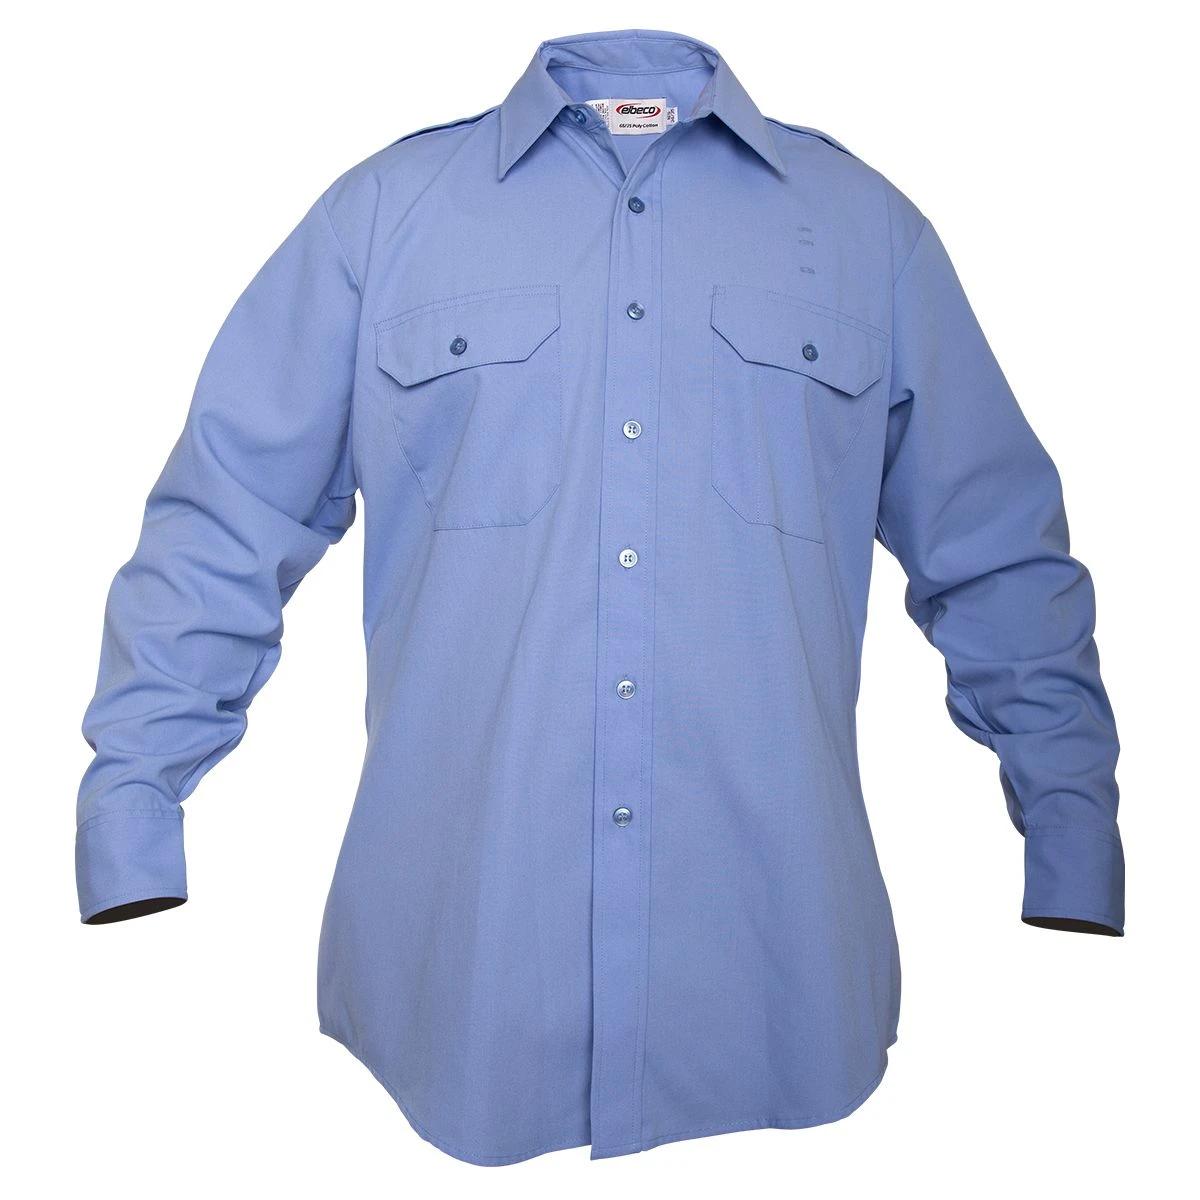 Elbeco First Responder Shirt